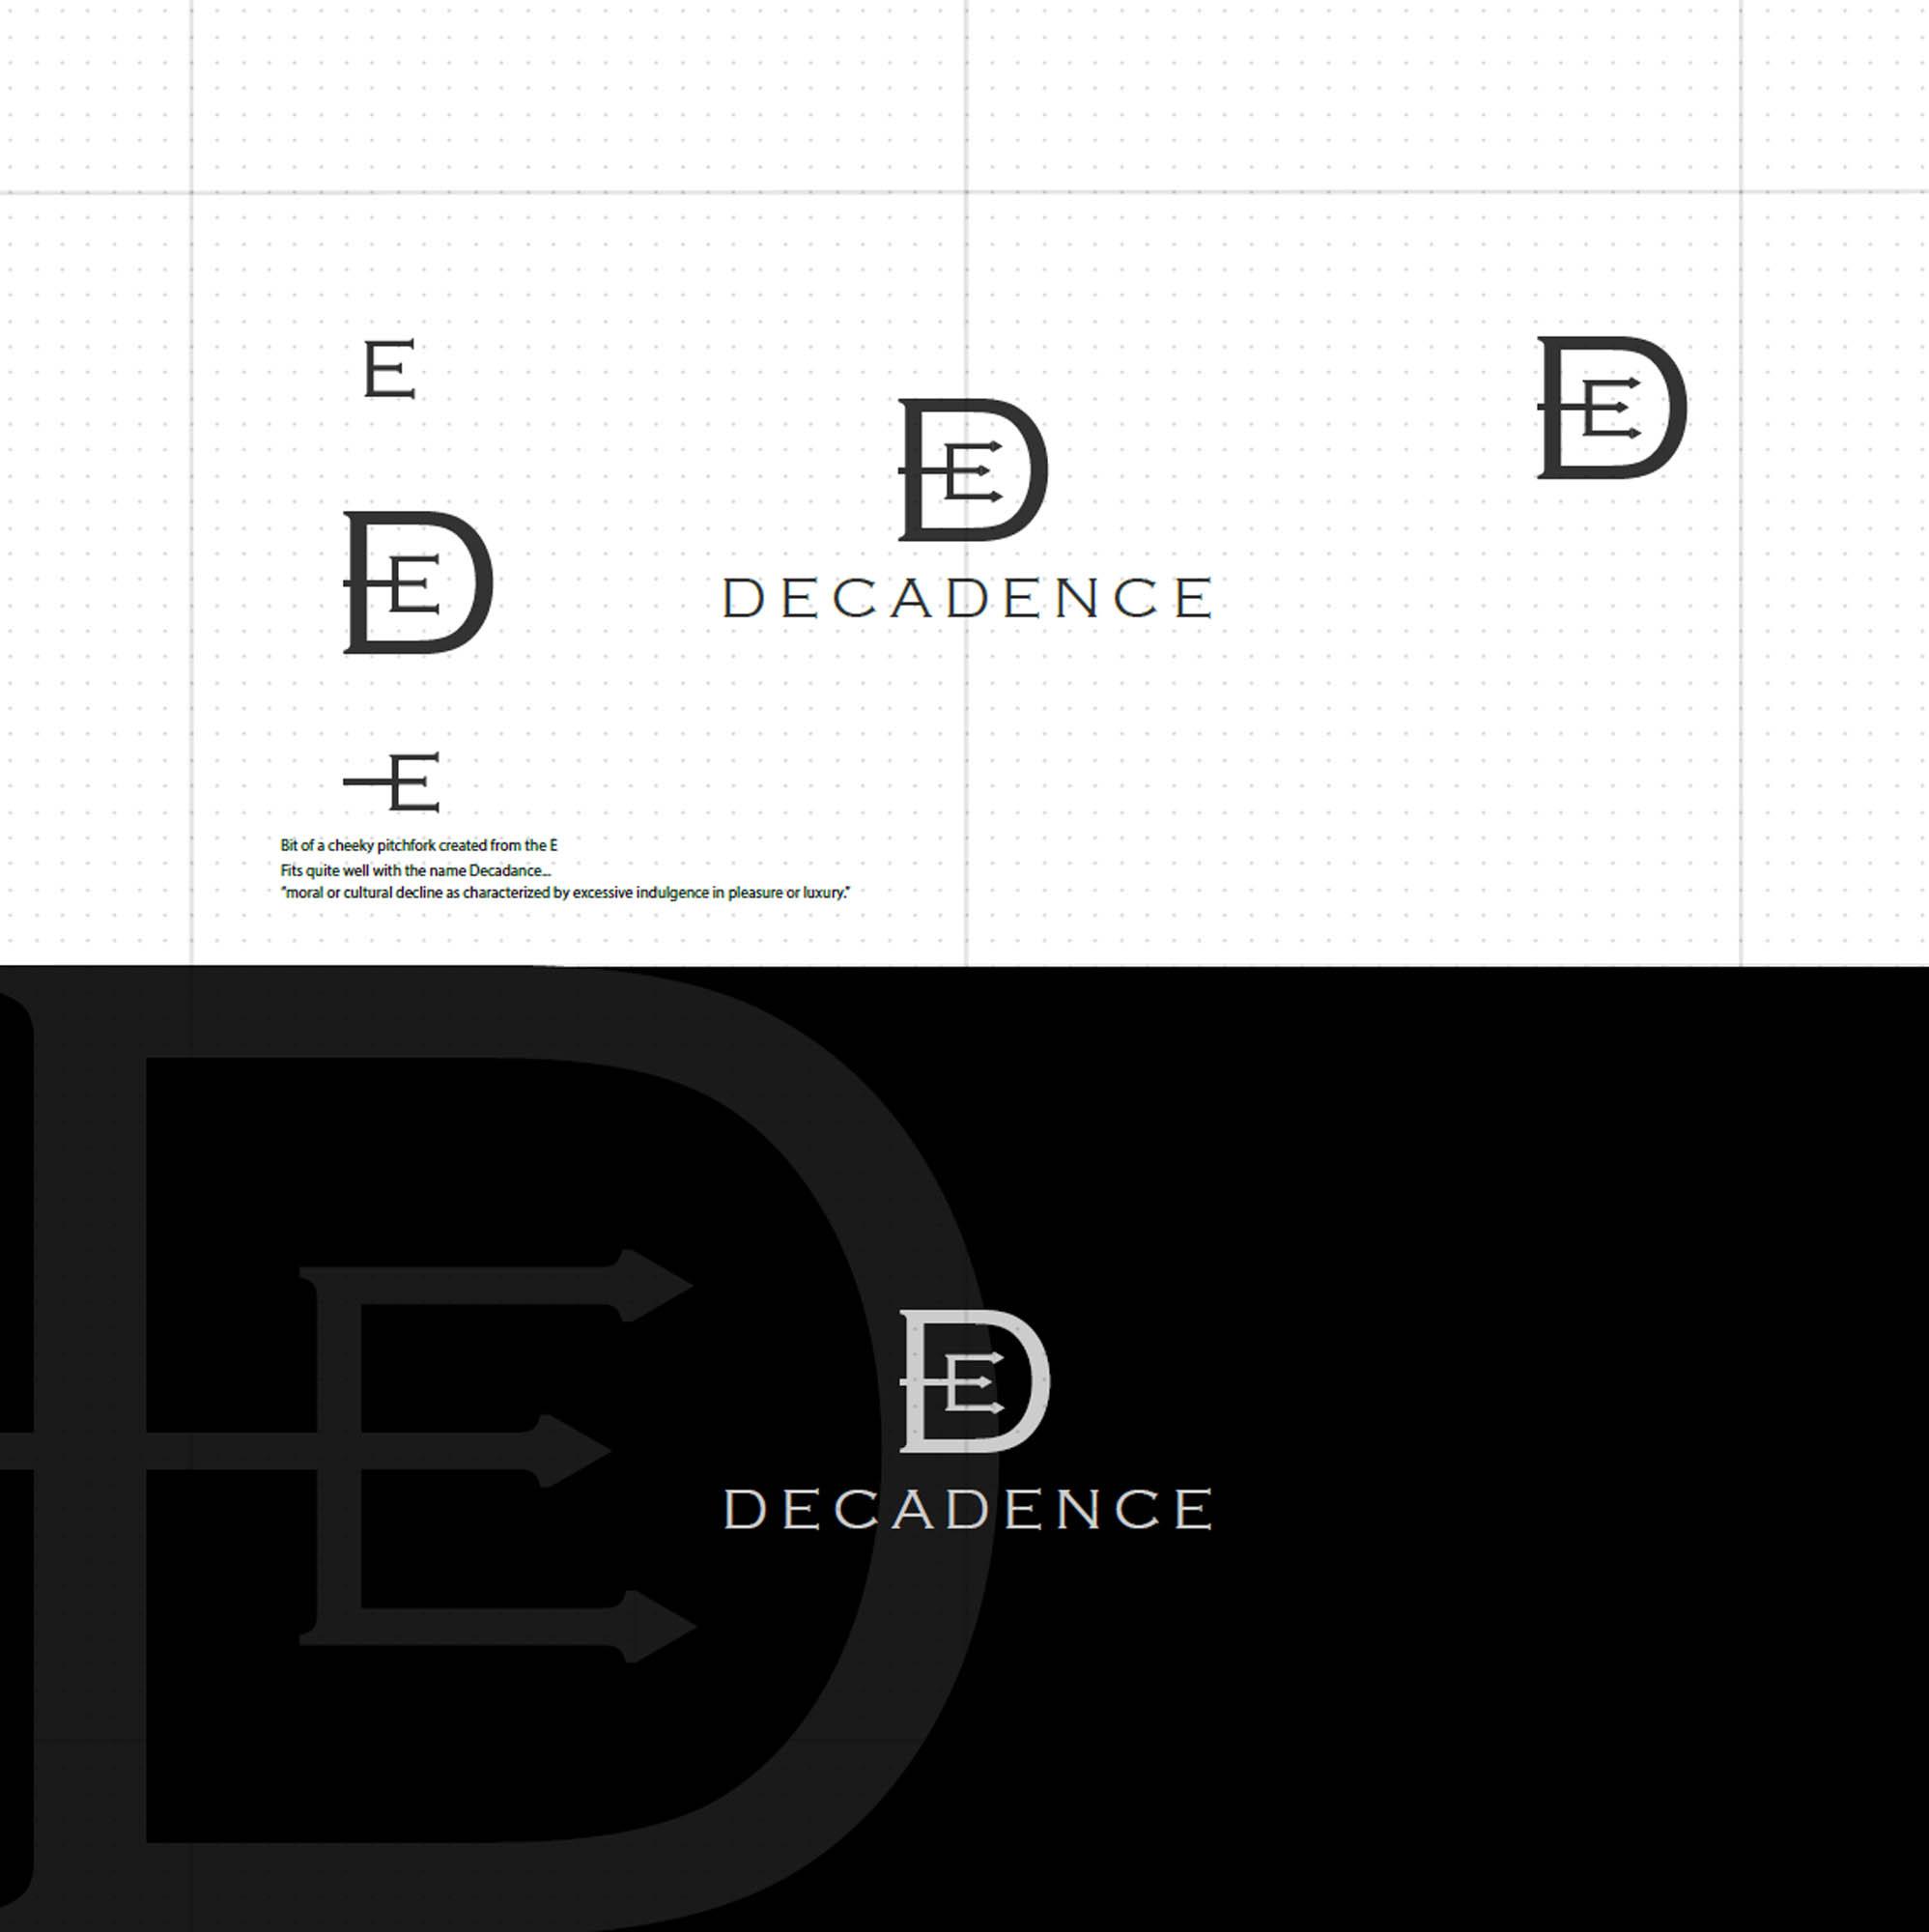 luxury-high-end-clothing-brand-logo-design-london05